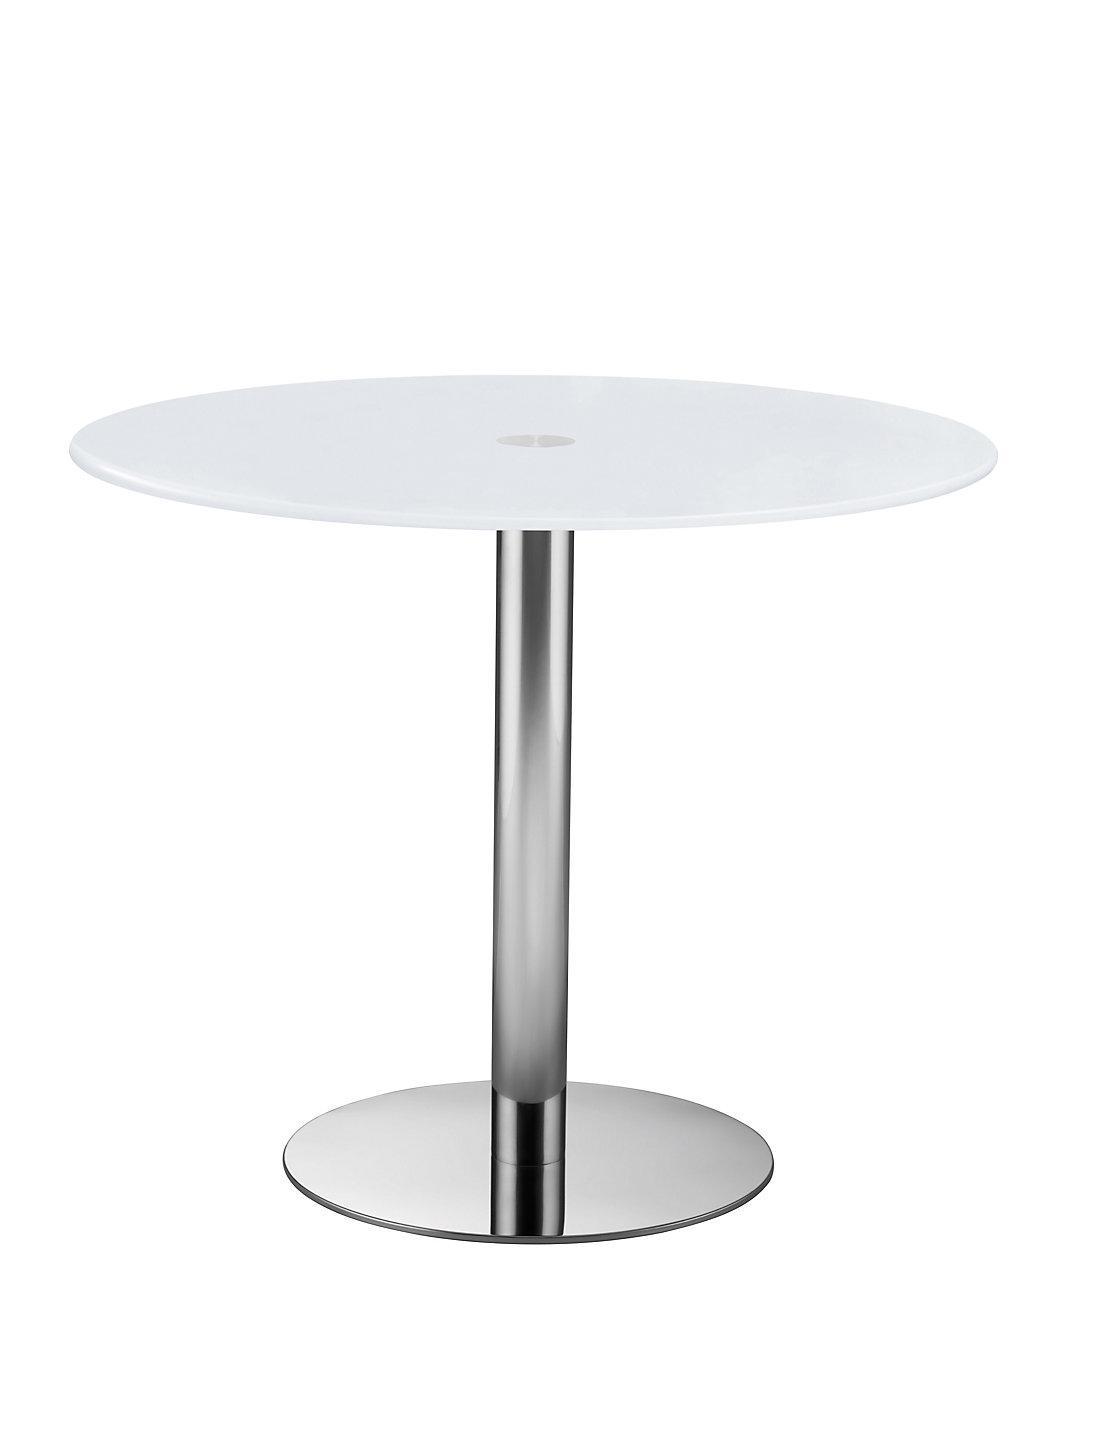 Gino white glass table ms gino white glass table geotapseo Choice Image